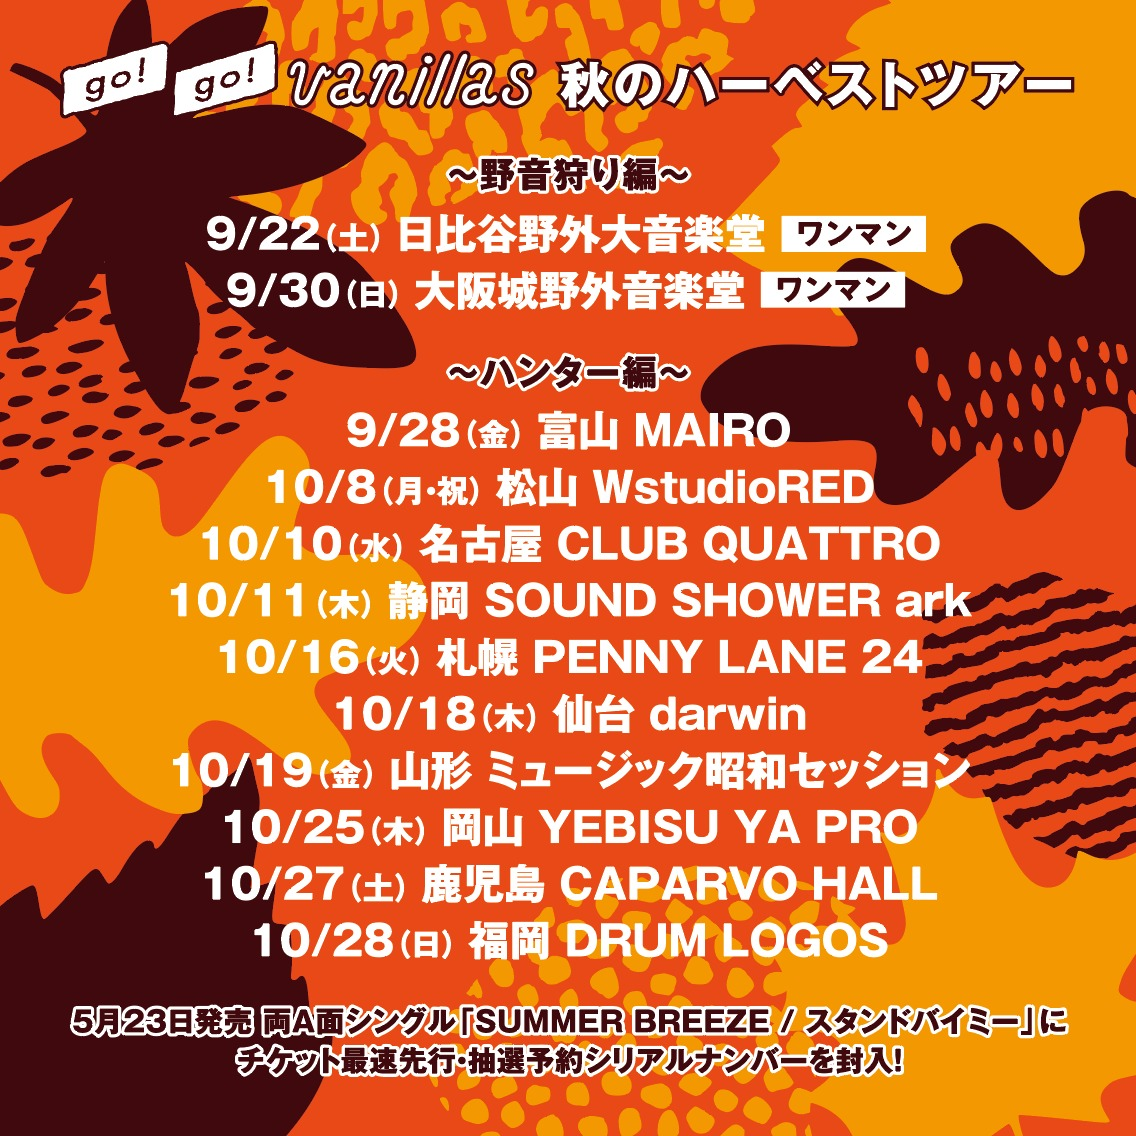 go!go!vanillas『秋のハーベストツアー』